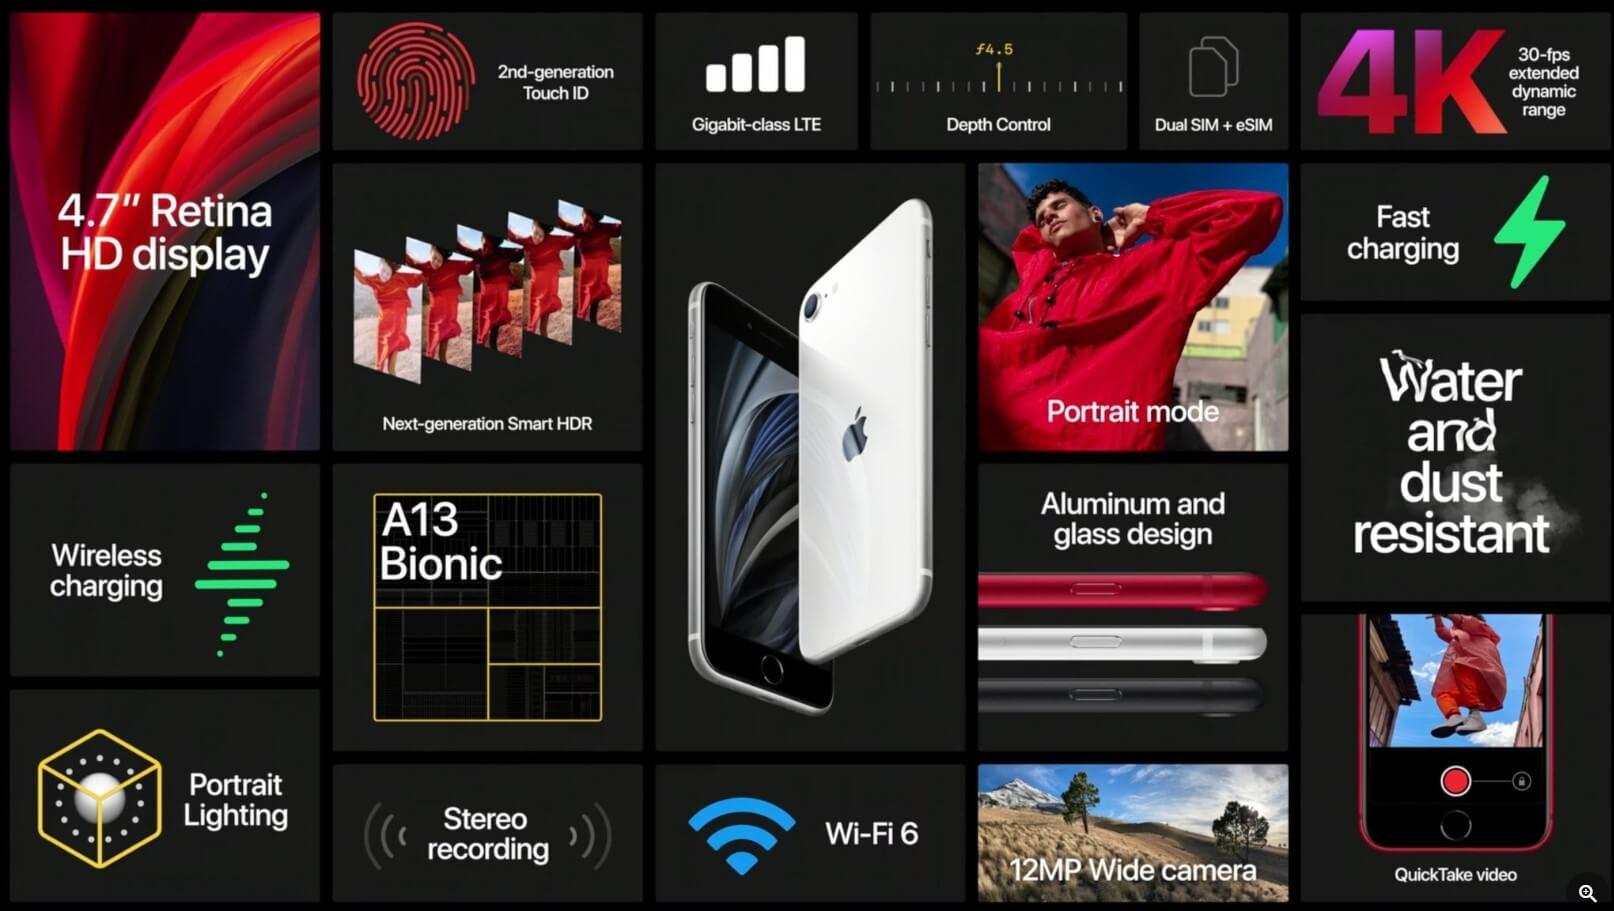 iPhone SE الجديد هنا! لديه قوة iPhone 11 ، ولكن يكلف 479 يورو فقط 3